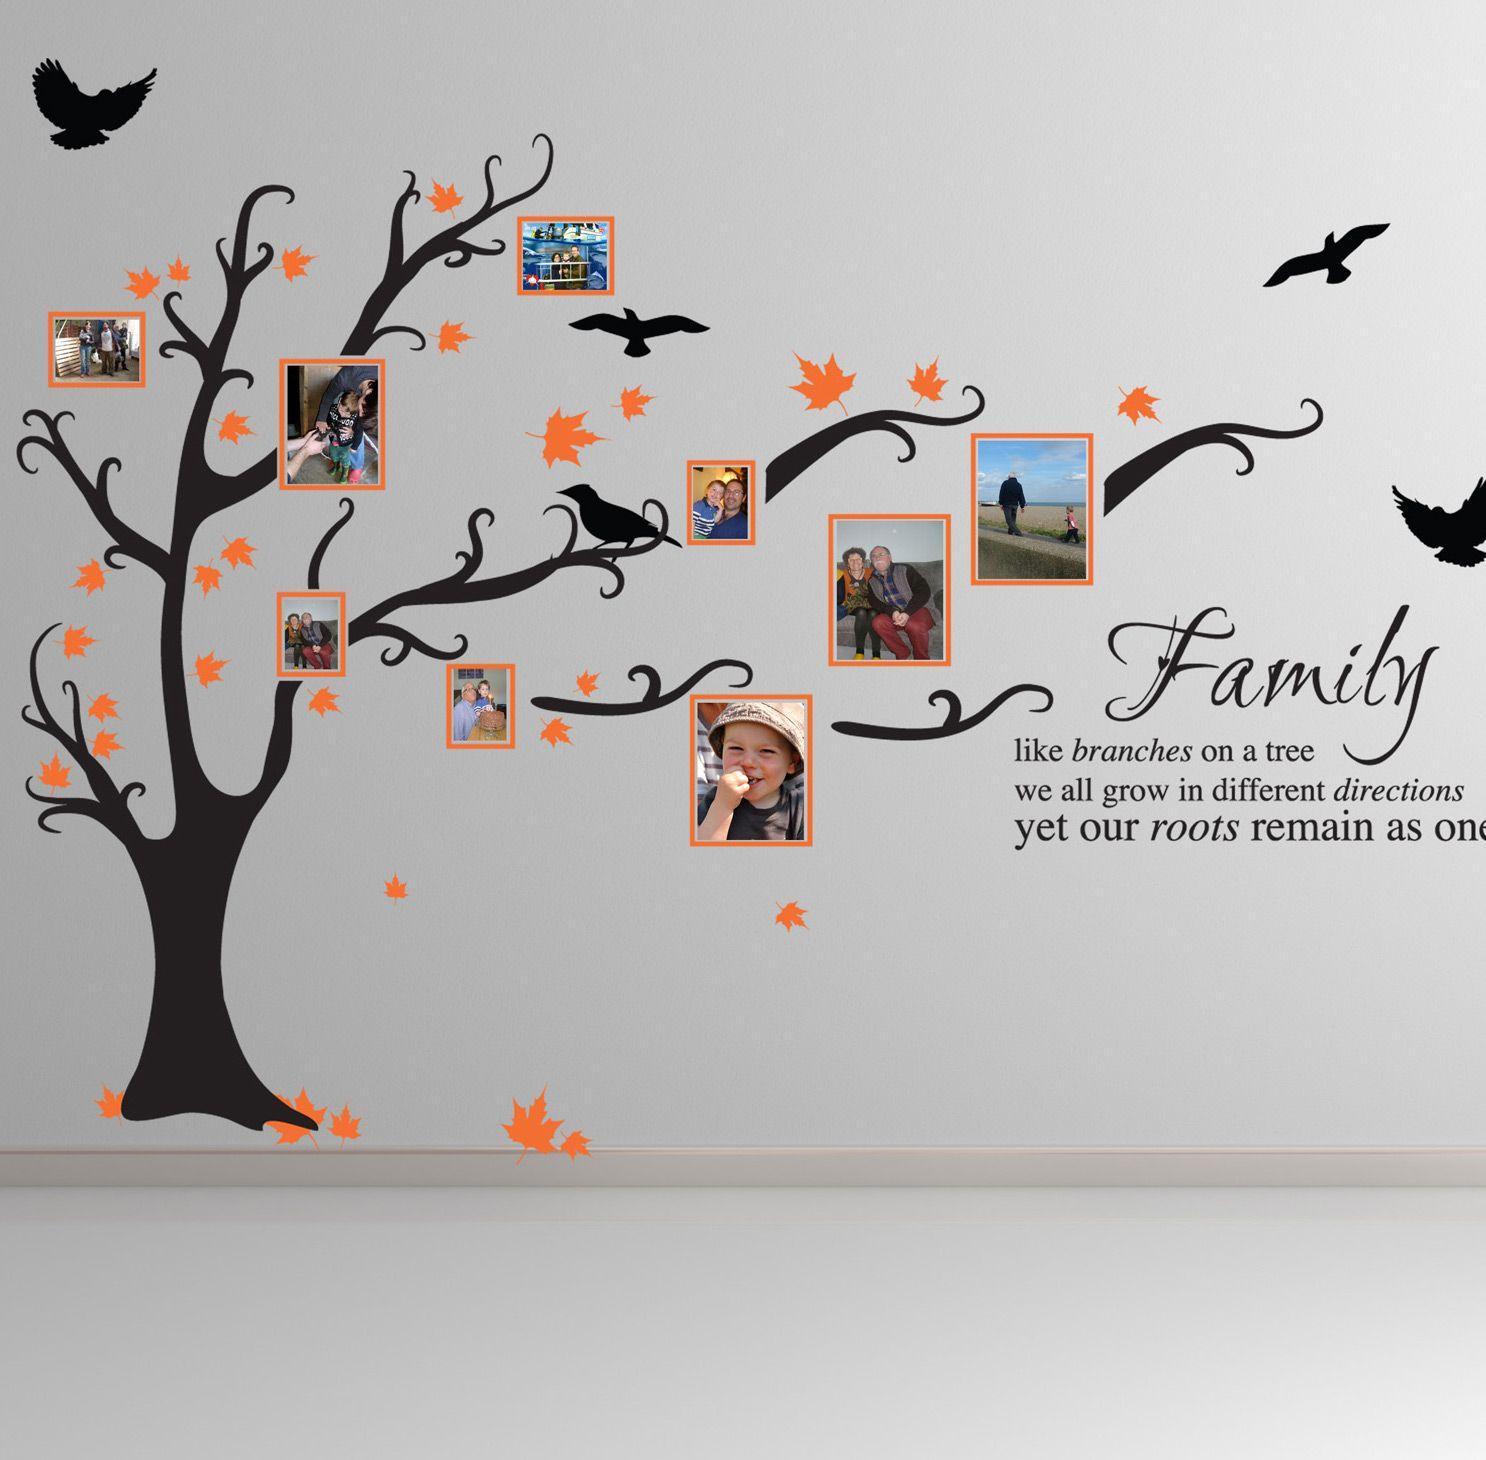 Family tree bird art wall stickers quotes decals ft1 art walls family tree bird art wall stickers quotes decals ft1 amipublicfo Image collections